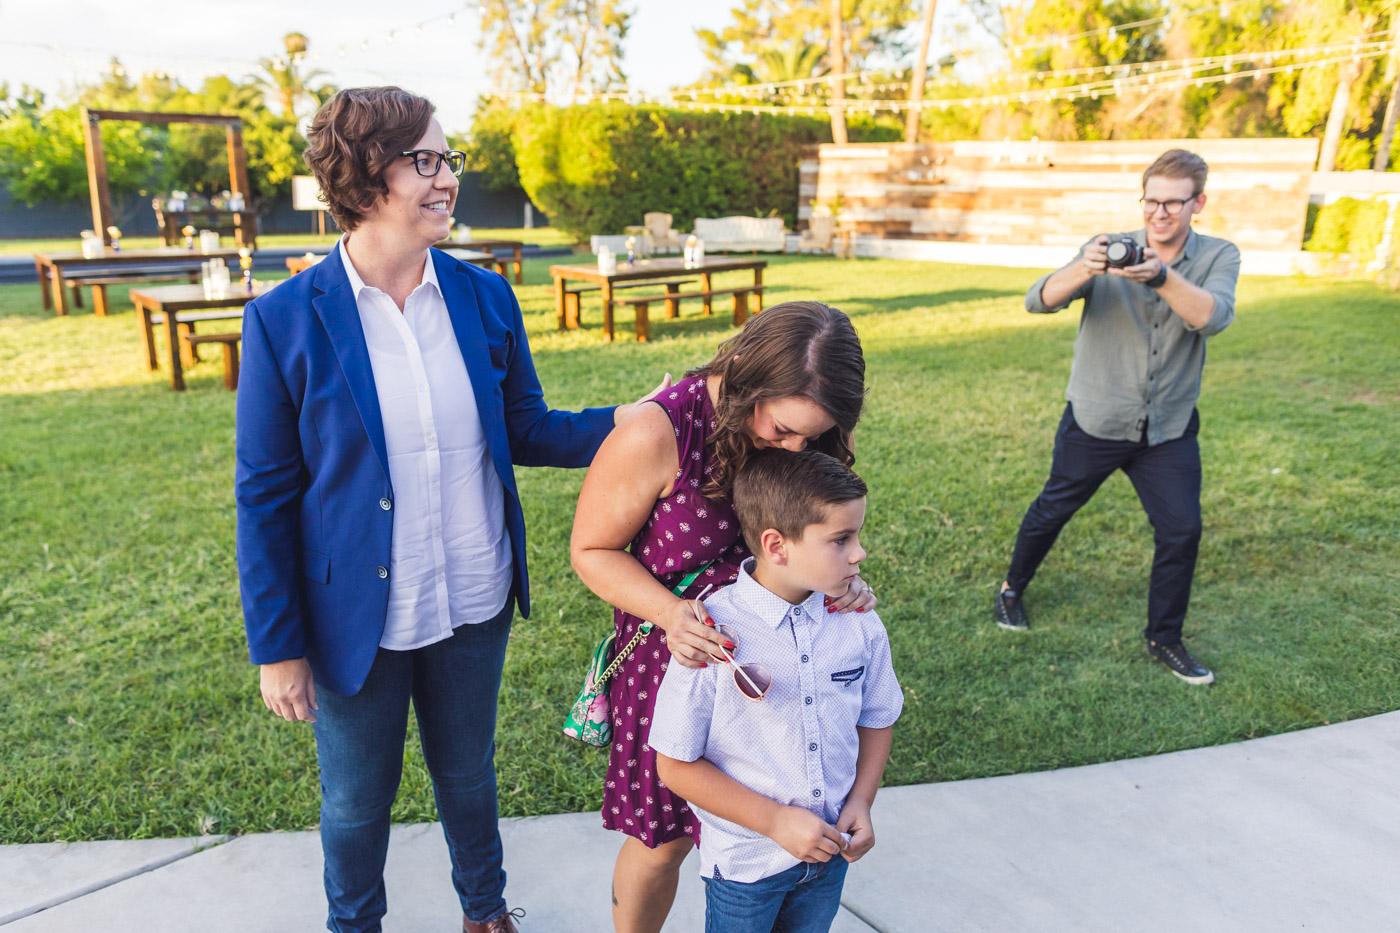 family-get-emotional-at-wedding-surprise